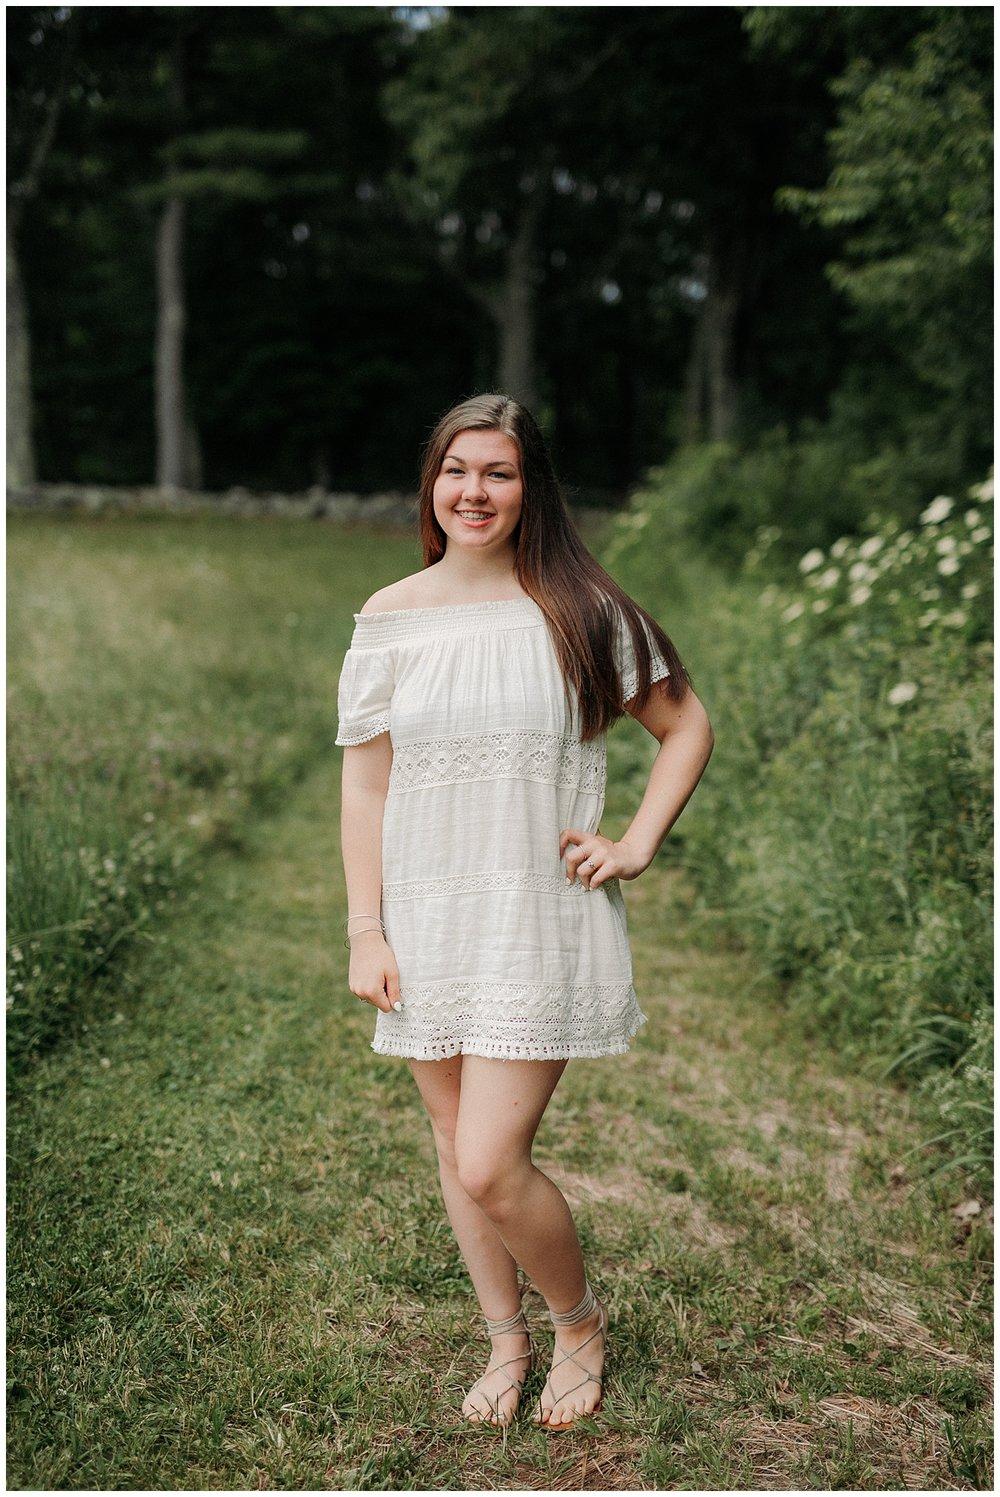 lindybeth photography - senior pictures - erin-3.jpg